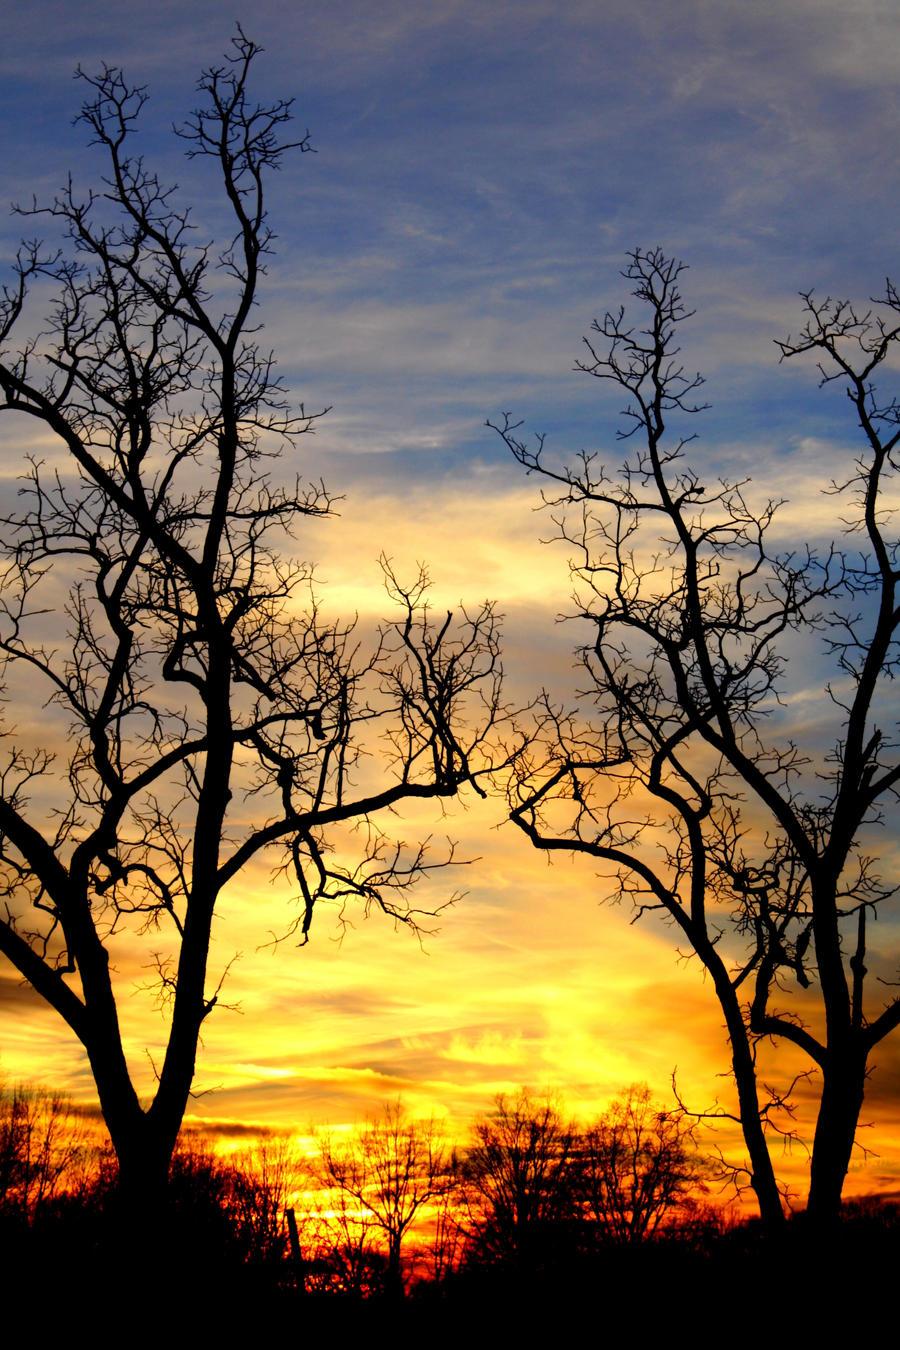 Carolina Sunset by Thundercatt99